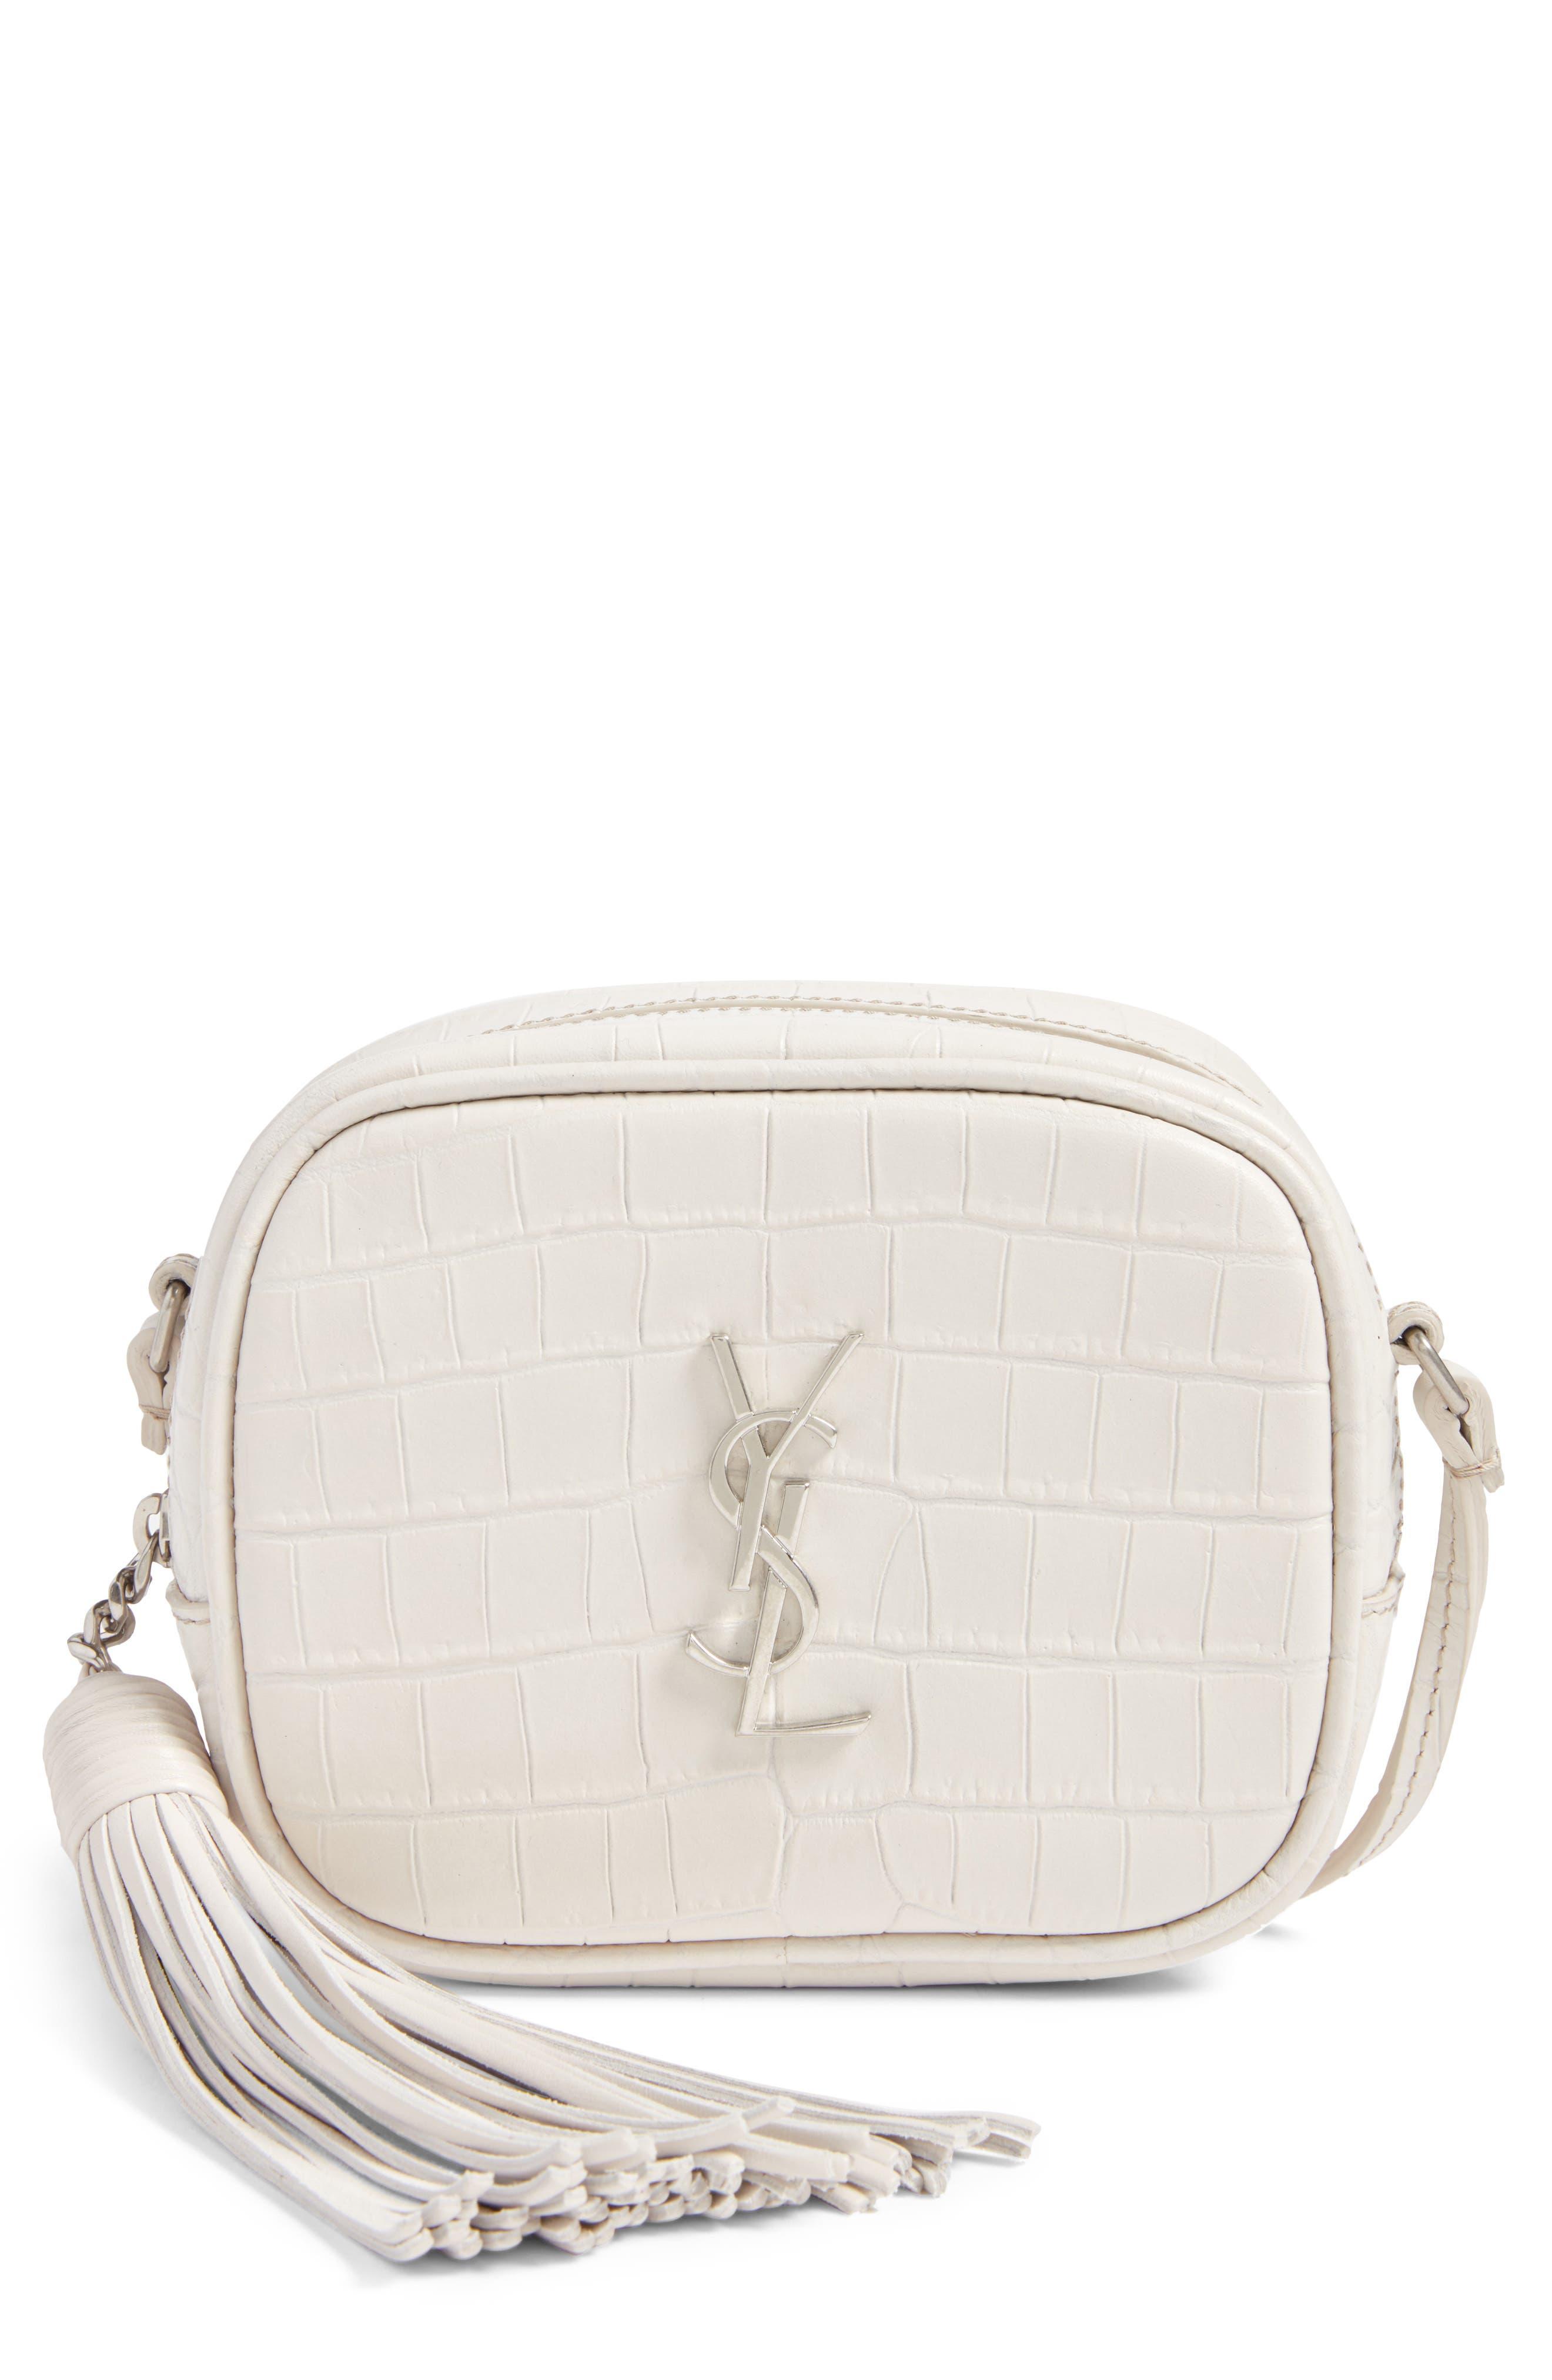 Saint Laurent Monogram Blogger Leather Crossbody Bag